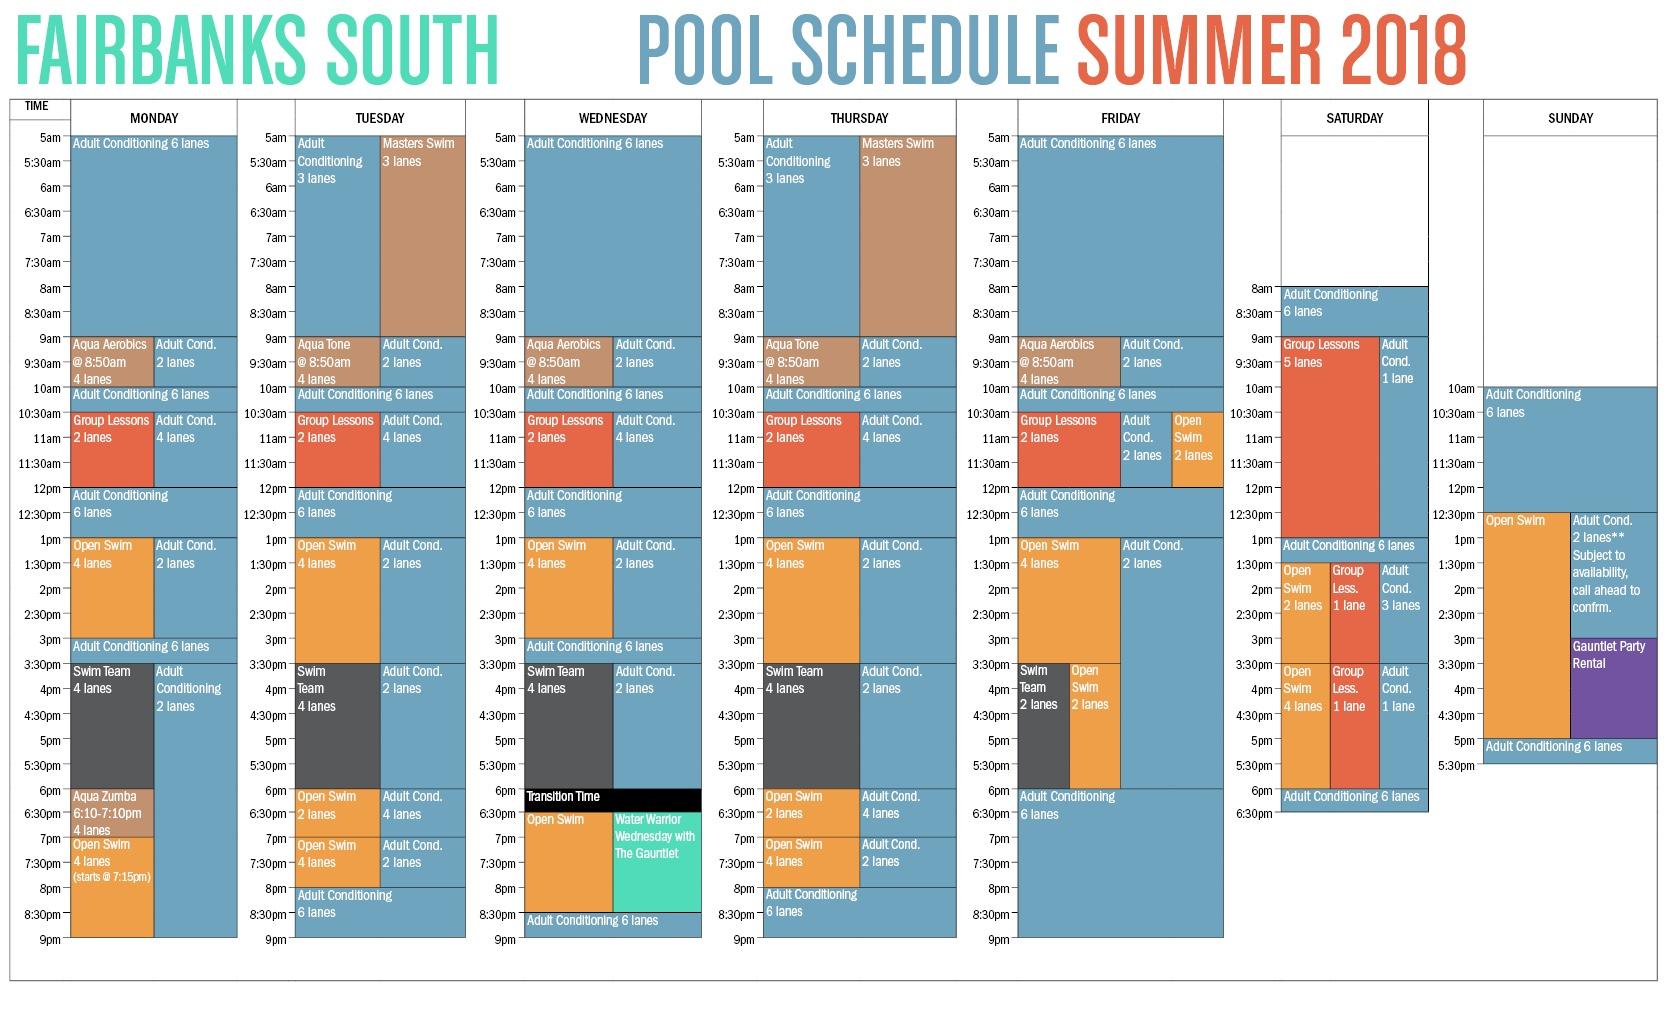 2018 Winter Spring Fairbanks Pool Schedule